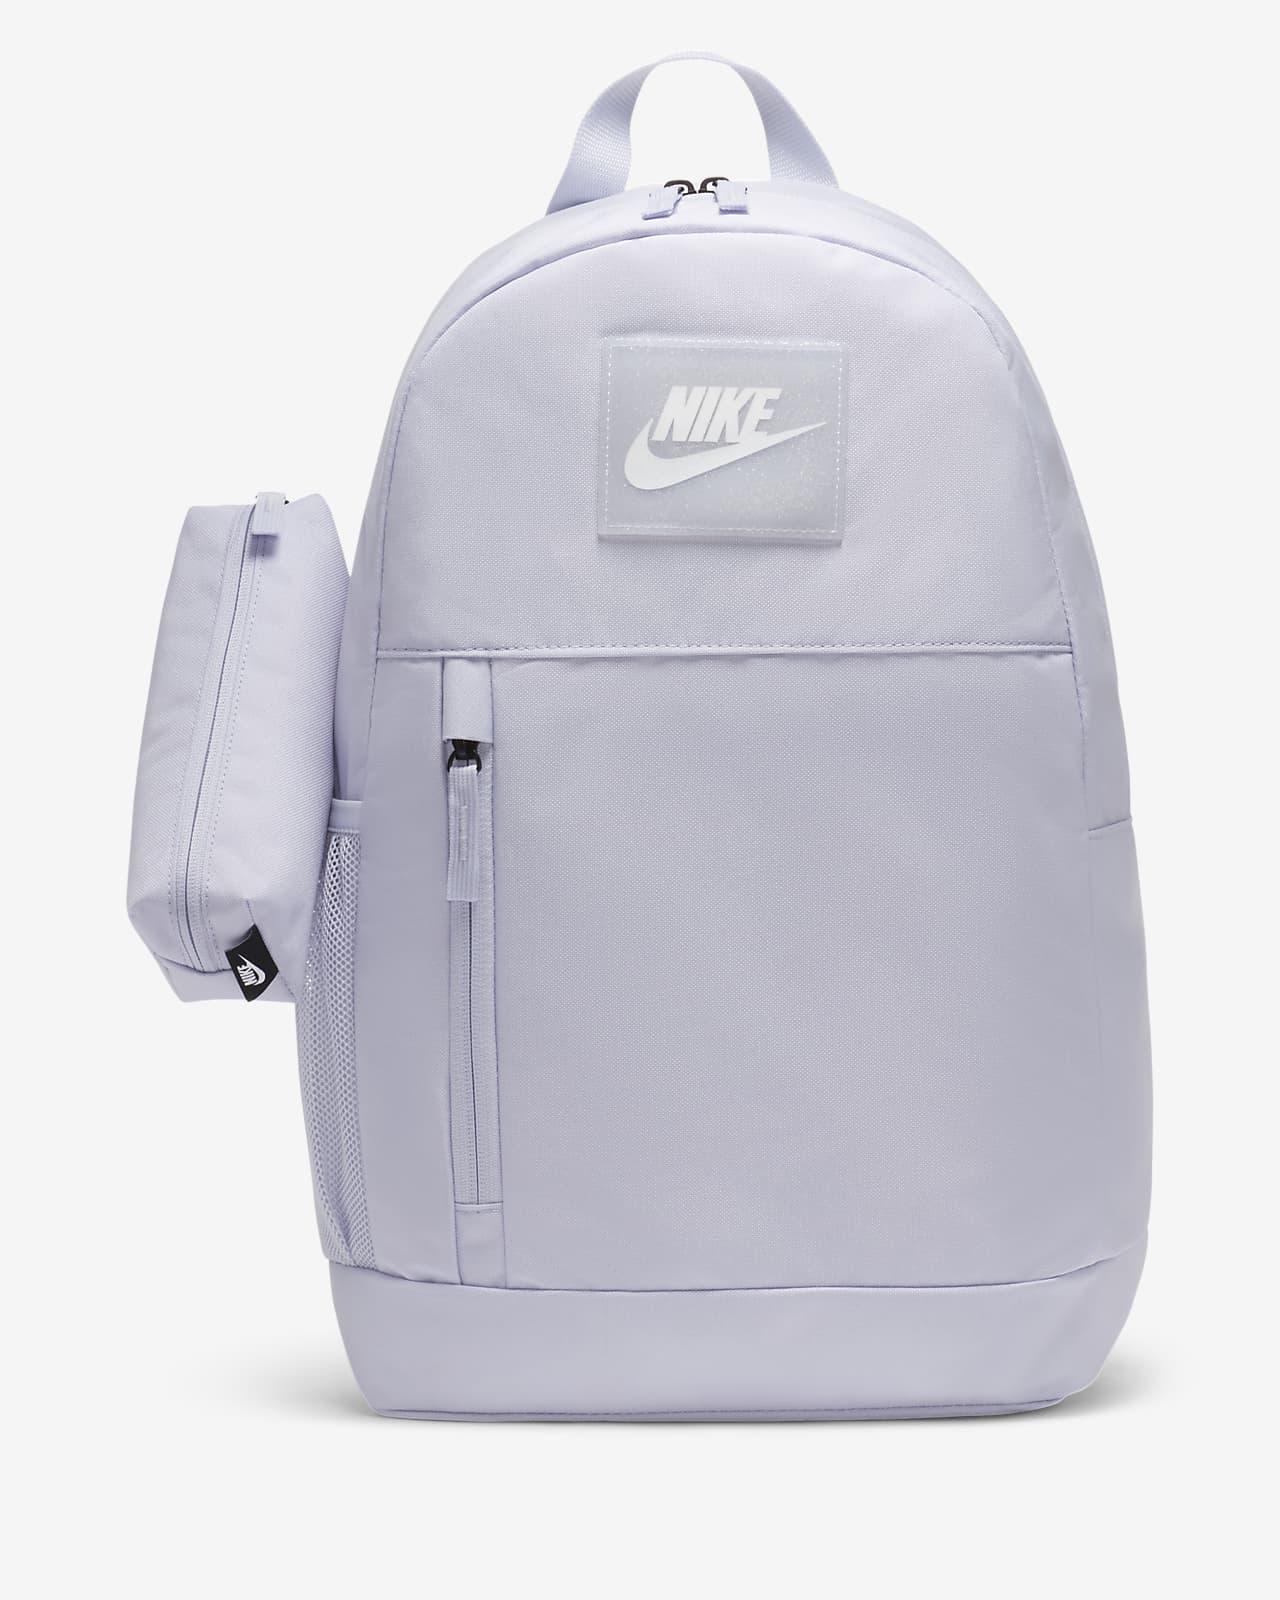 Nike Elemental Kids' Graphic Backpack